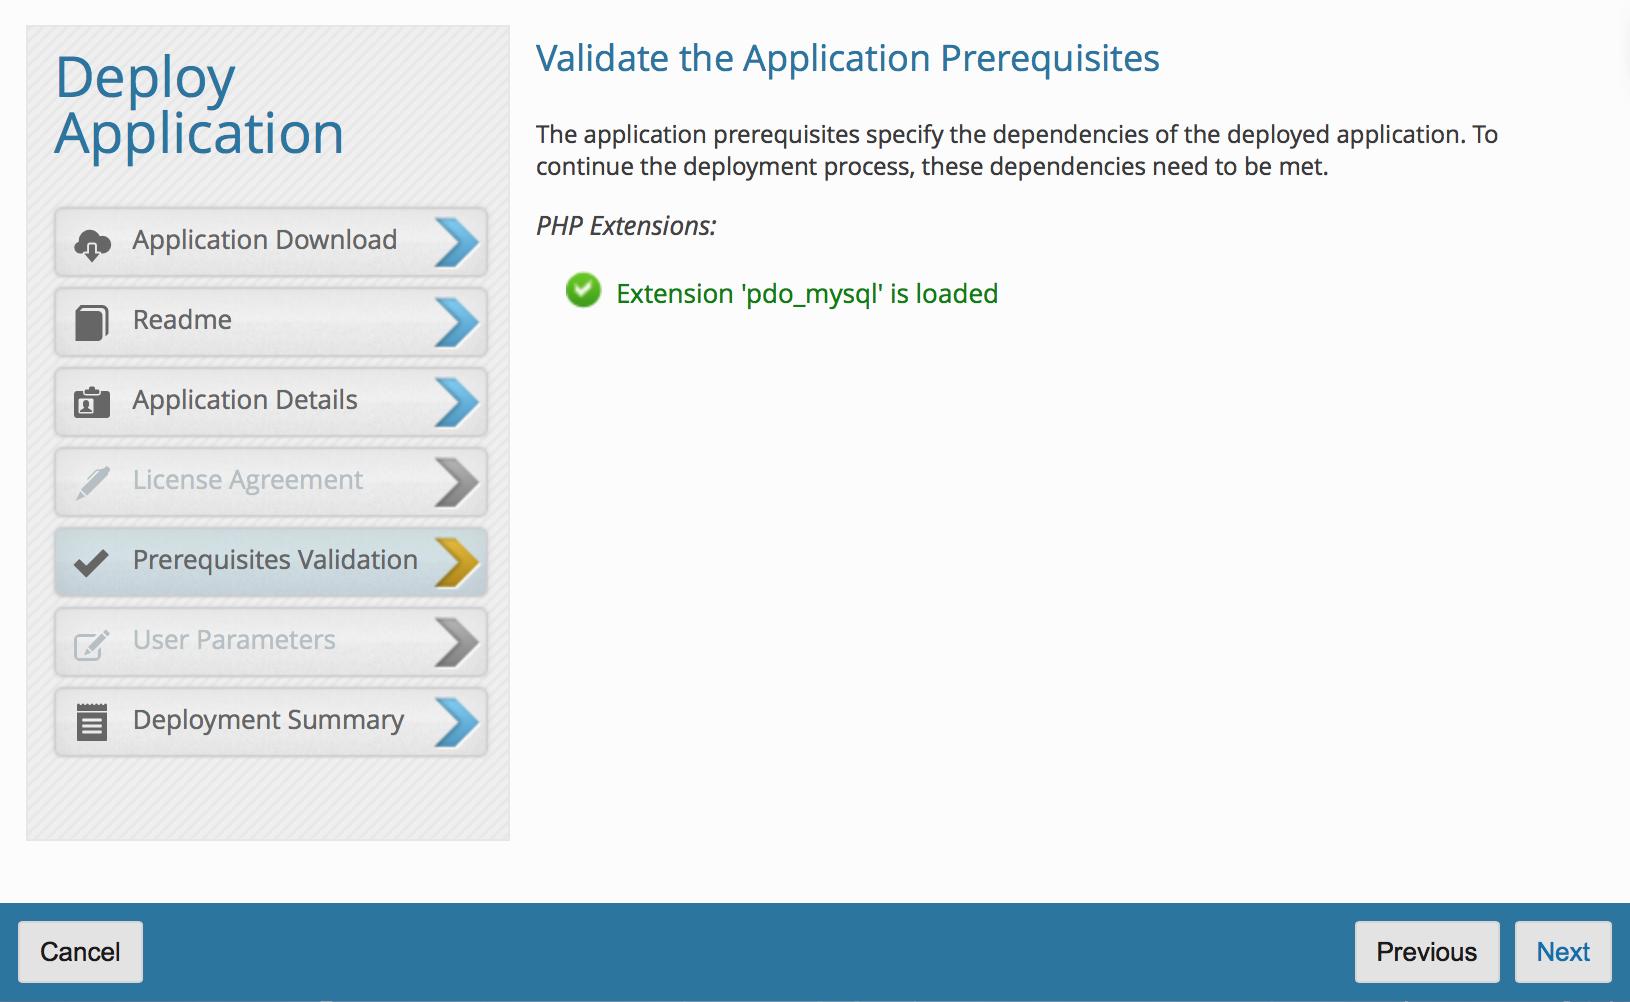 ps zend demo app step 2 validation